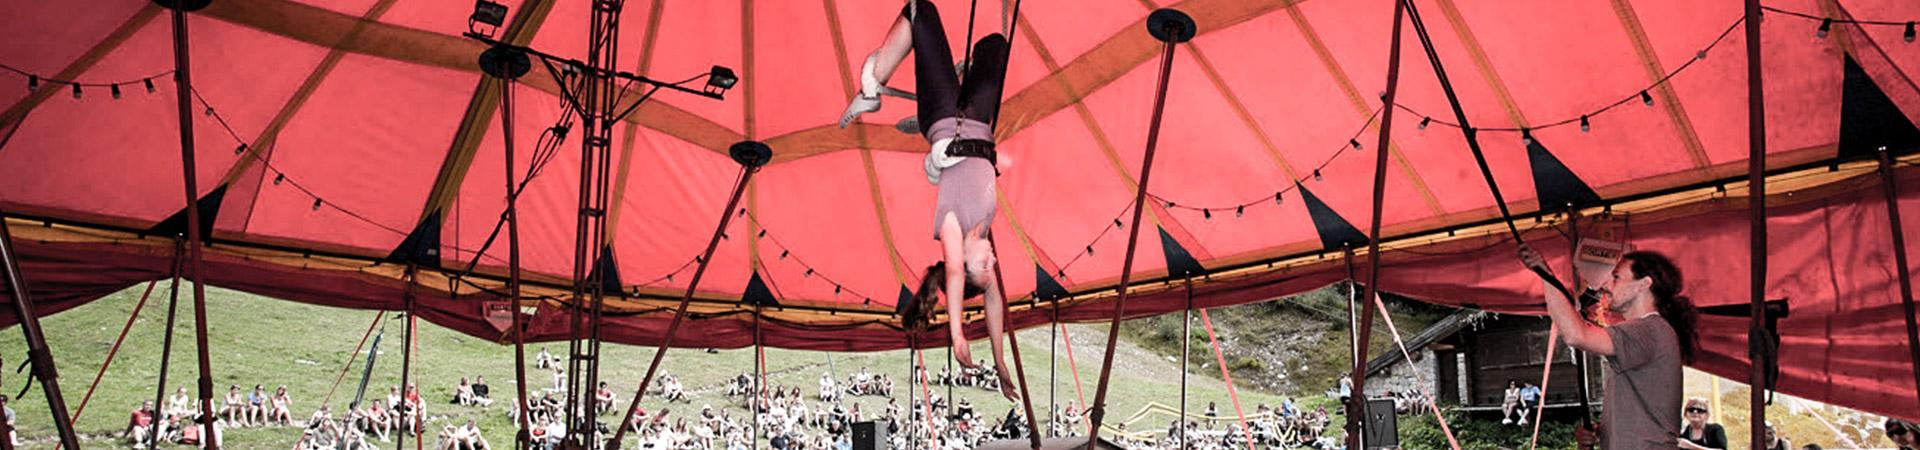 bandeau_cirque.jpg